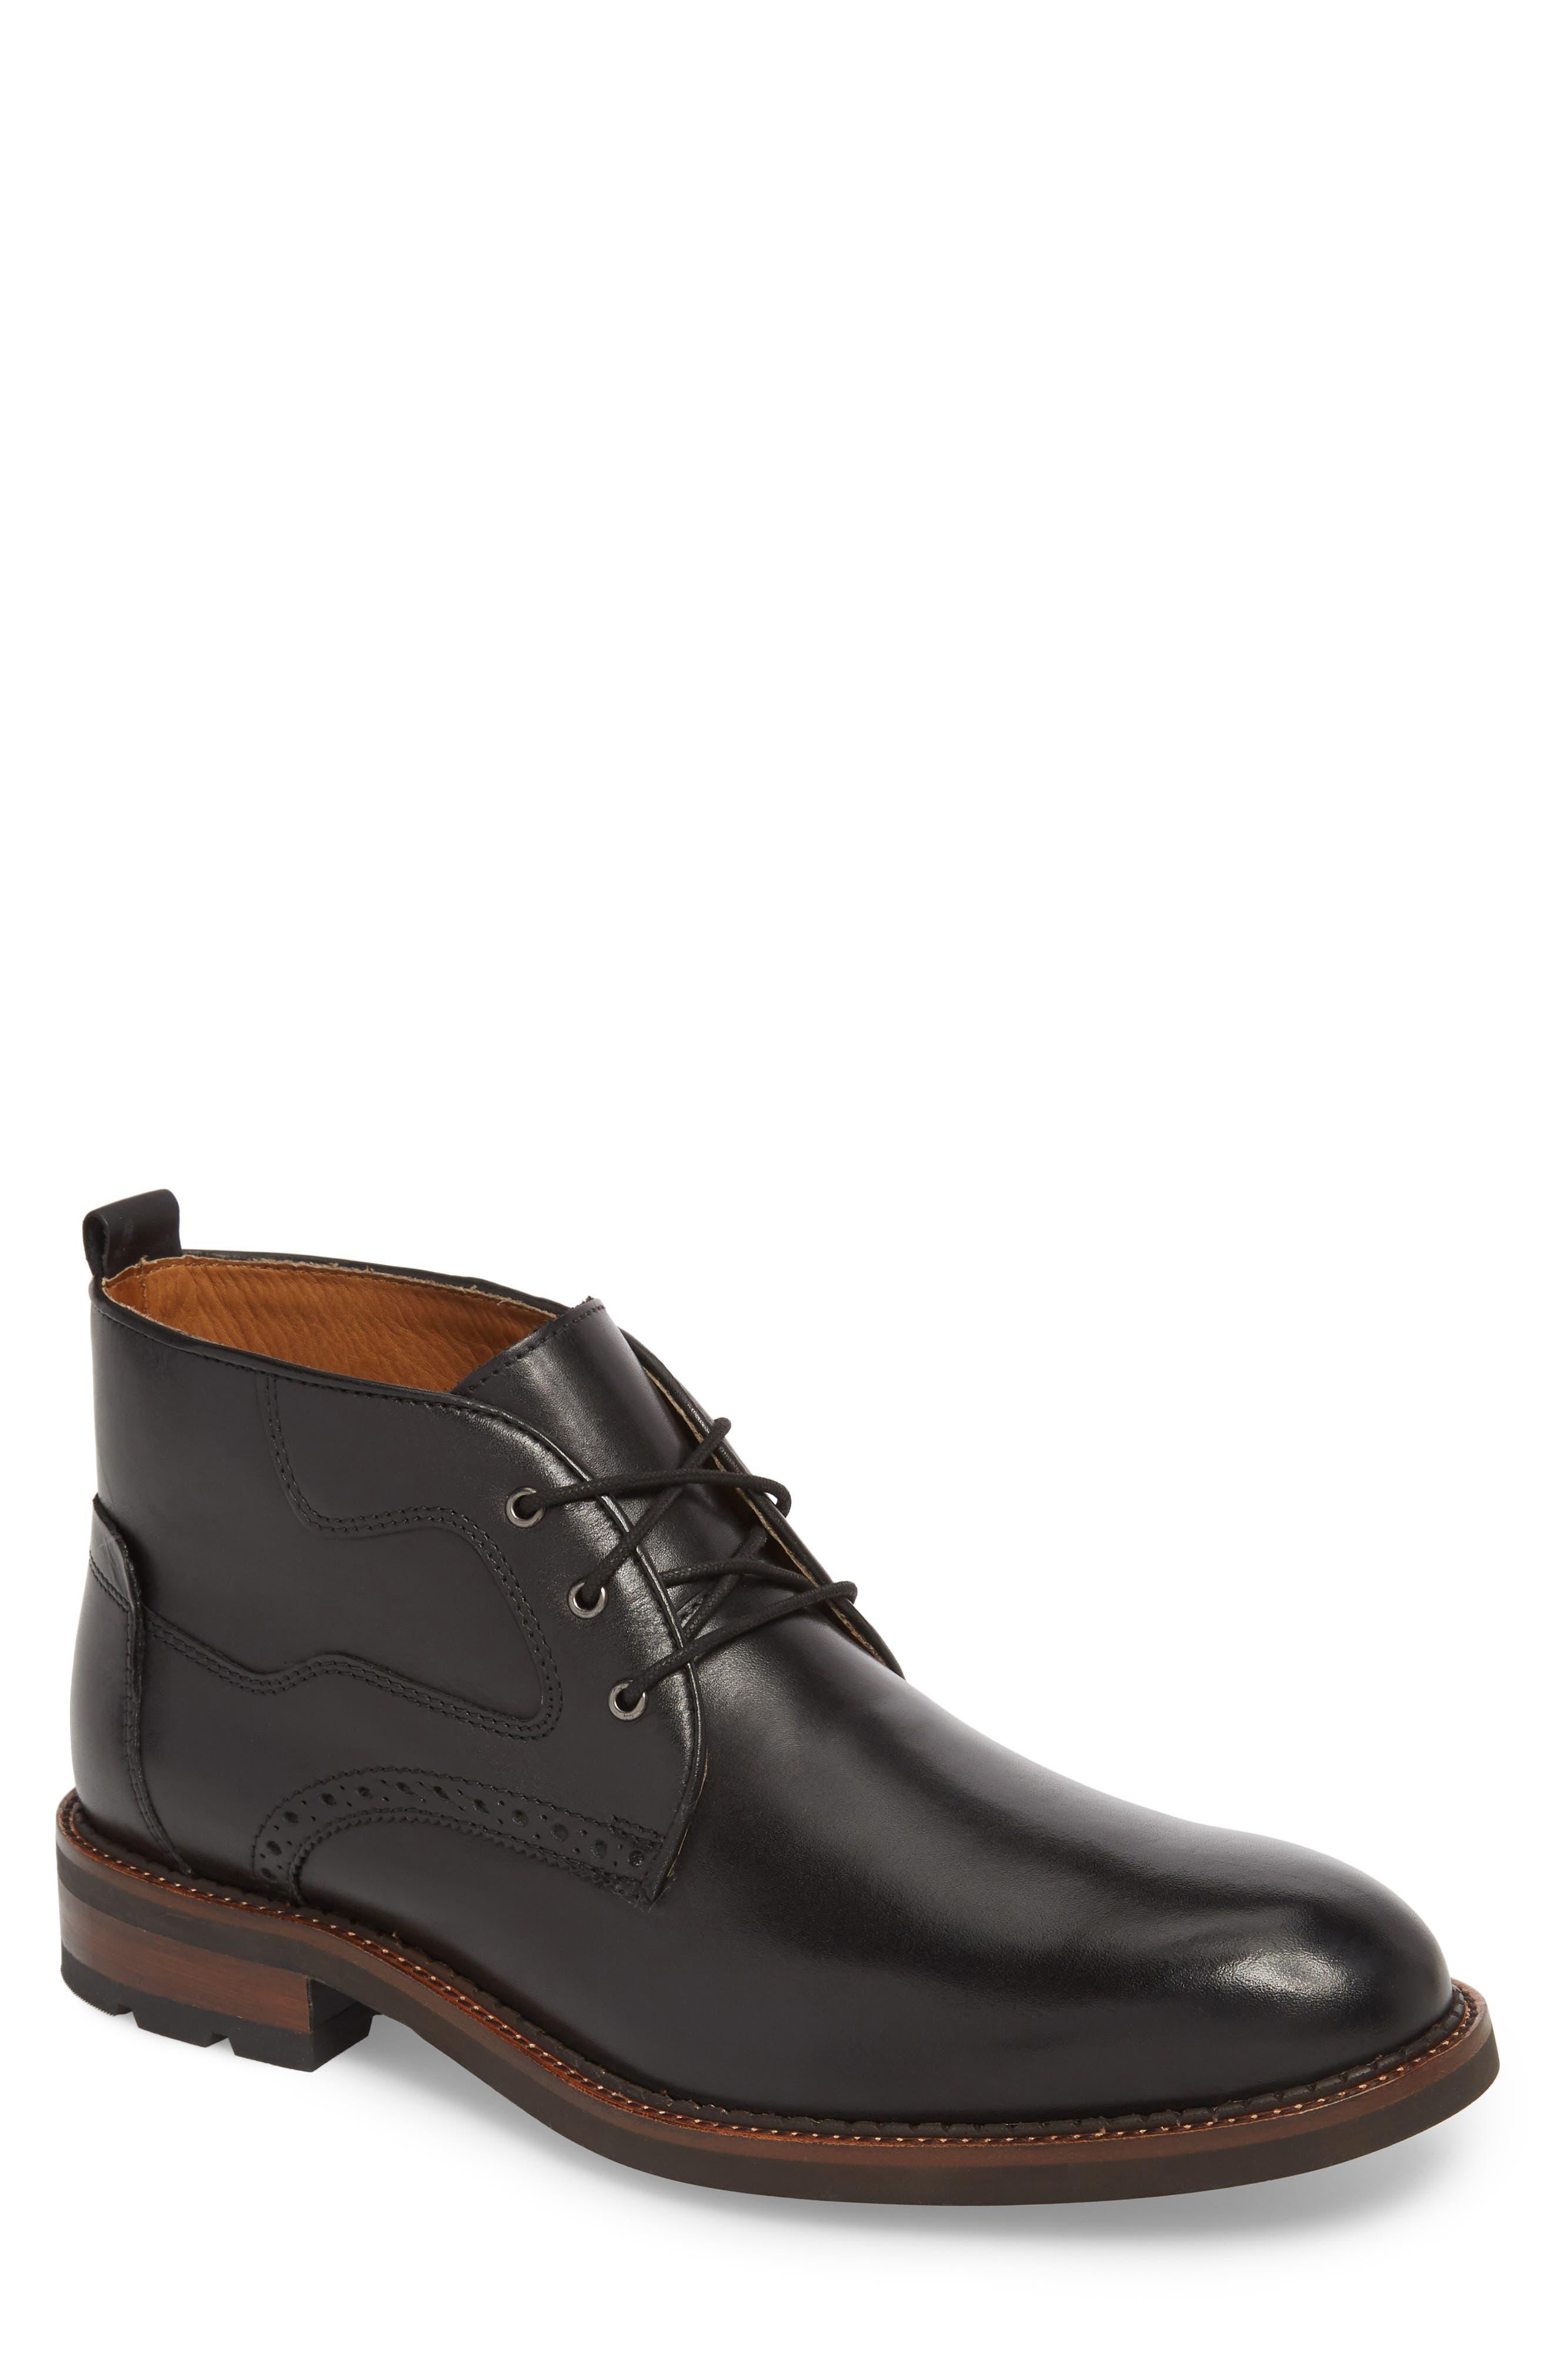 J & m 1850 Fullerton Chukka Boot